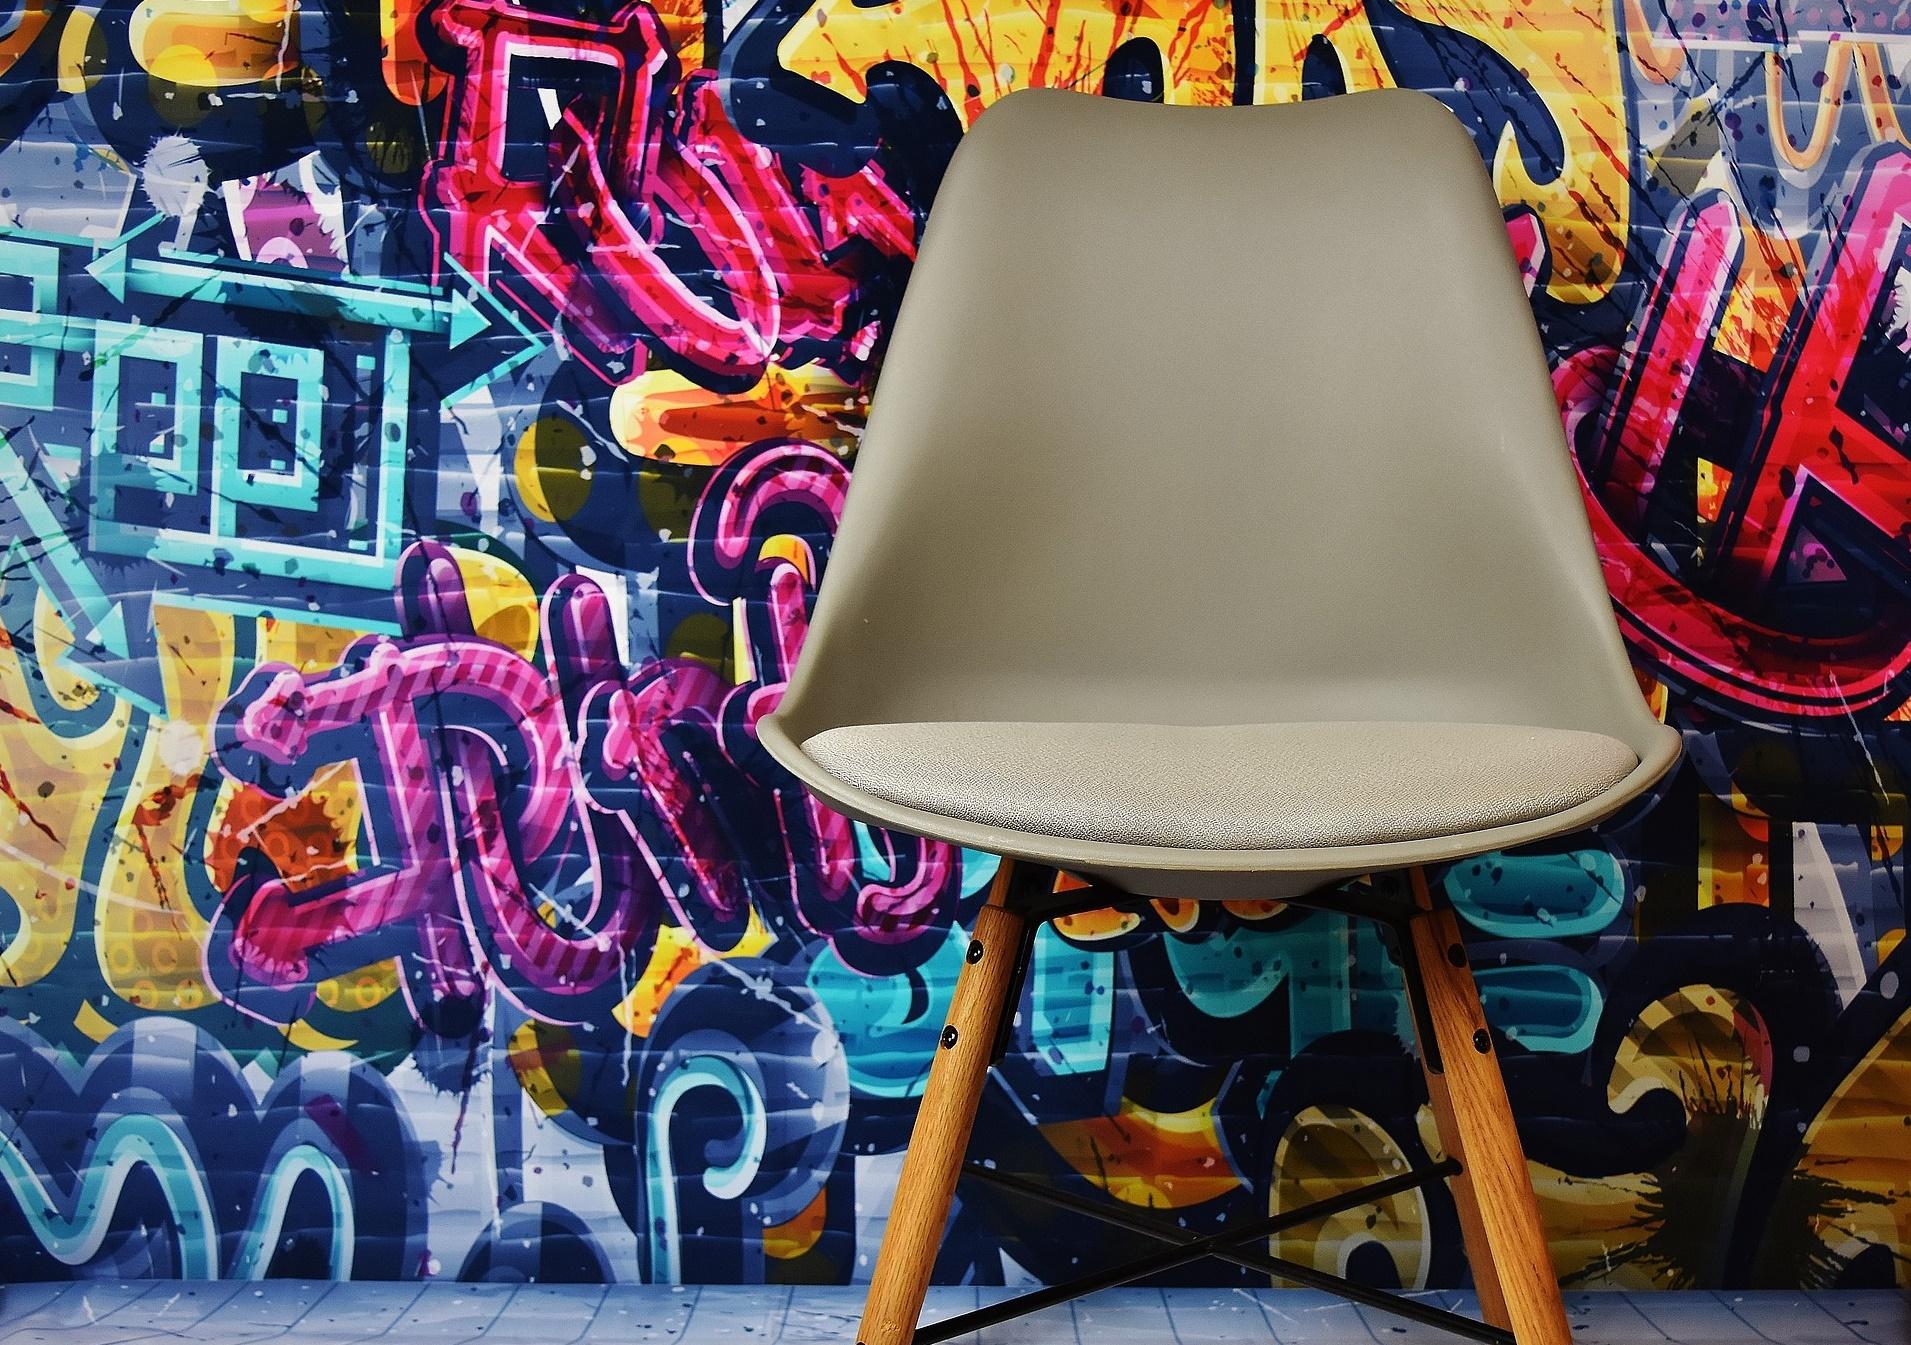 Silla vacía delante de pared con grafiti